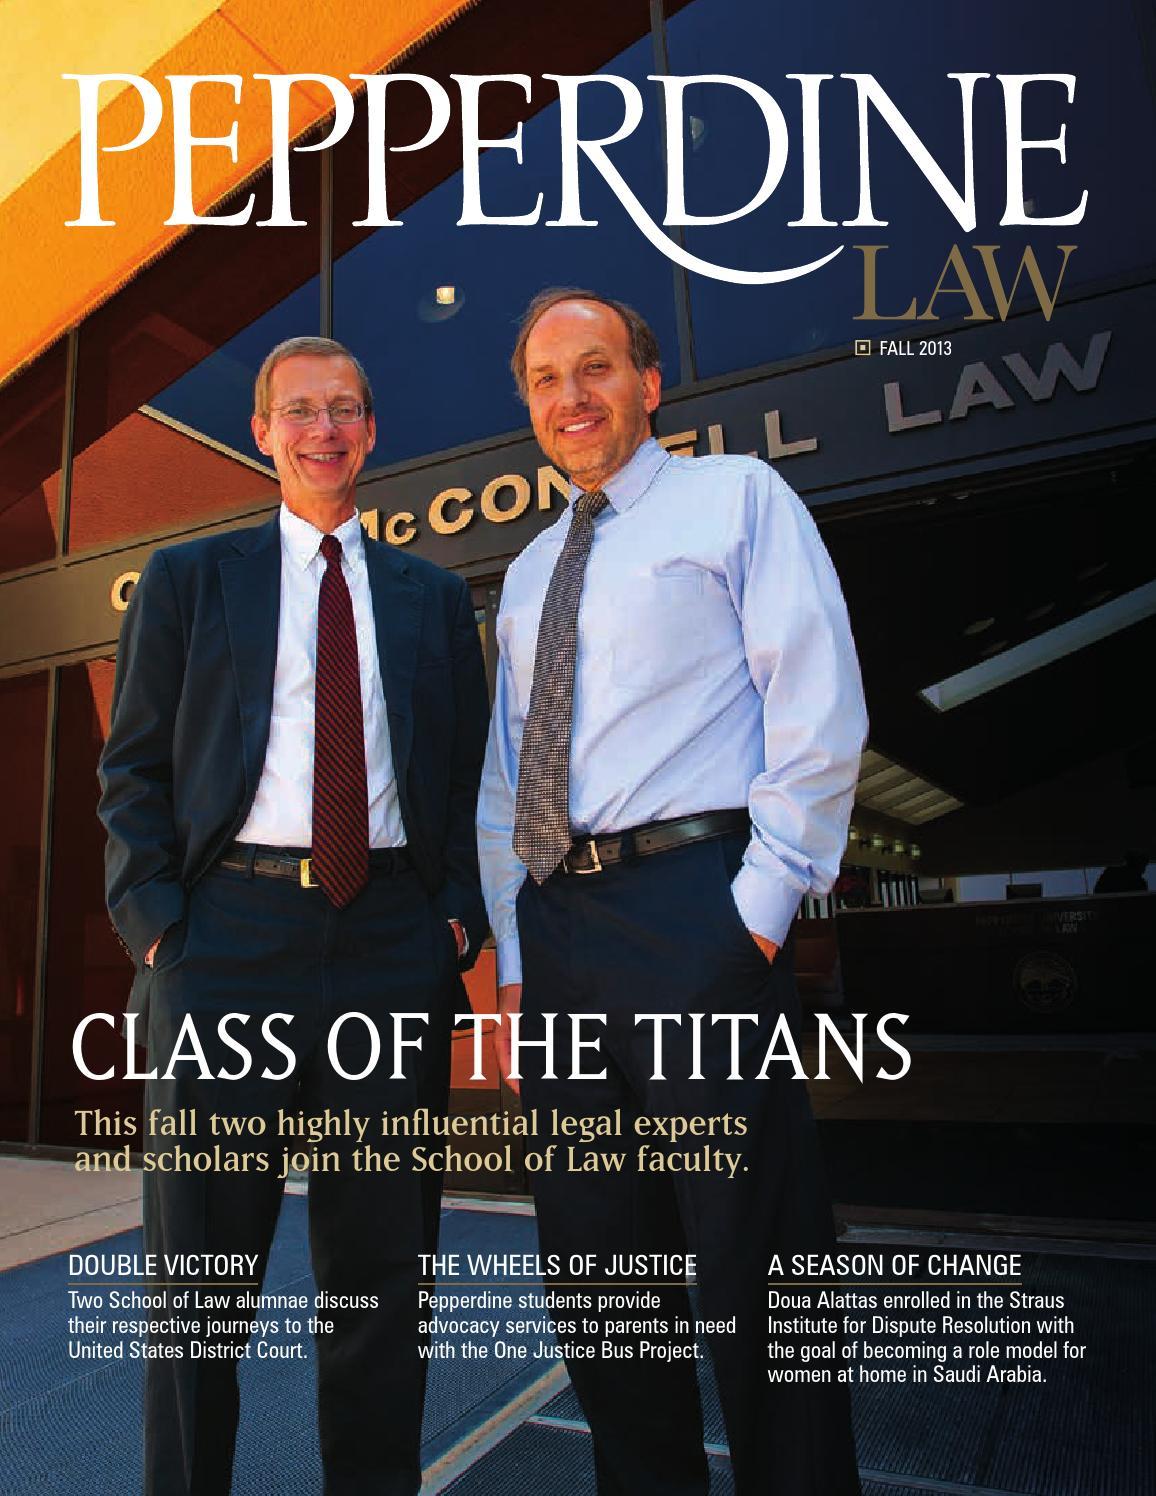 Pepperdine Law Vol 32 No 1 Fall 2013 By Pepperdine University